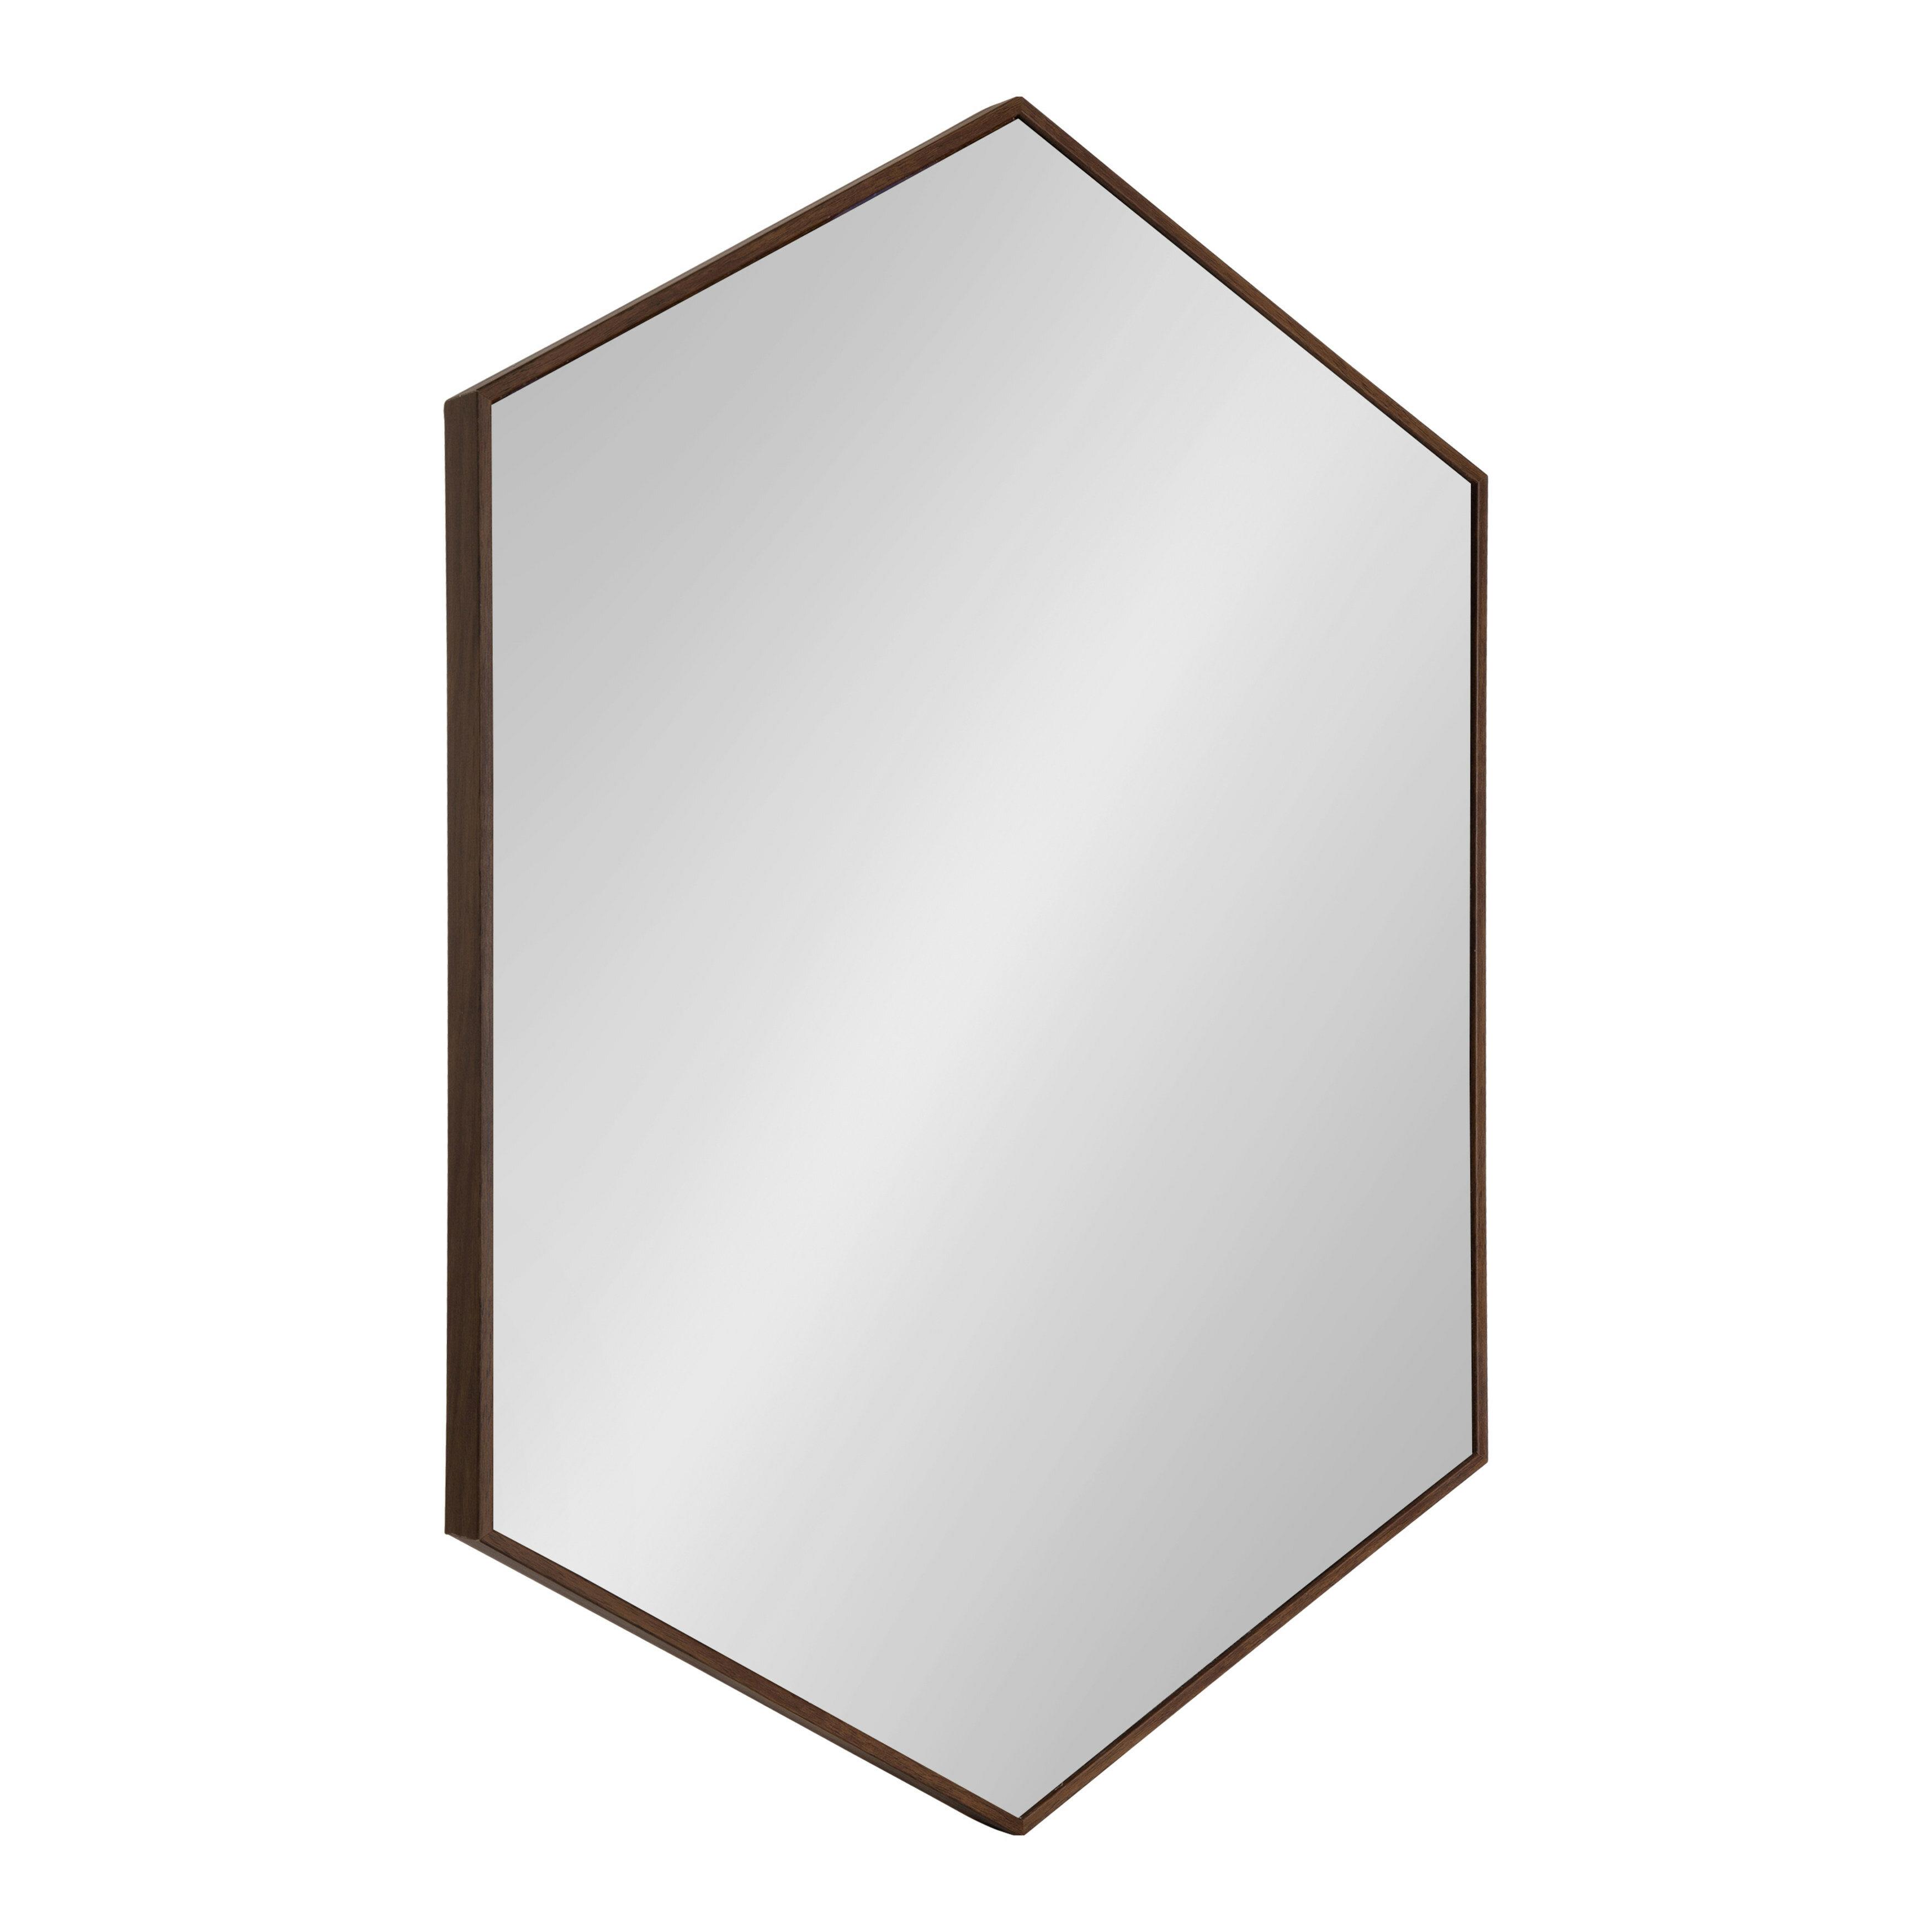 Zaliki Mid Century Hexagon Accent Mirror & Reviews | Allmodern With Northcutt Accent Mirrors (View 20 of 30)